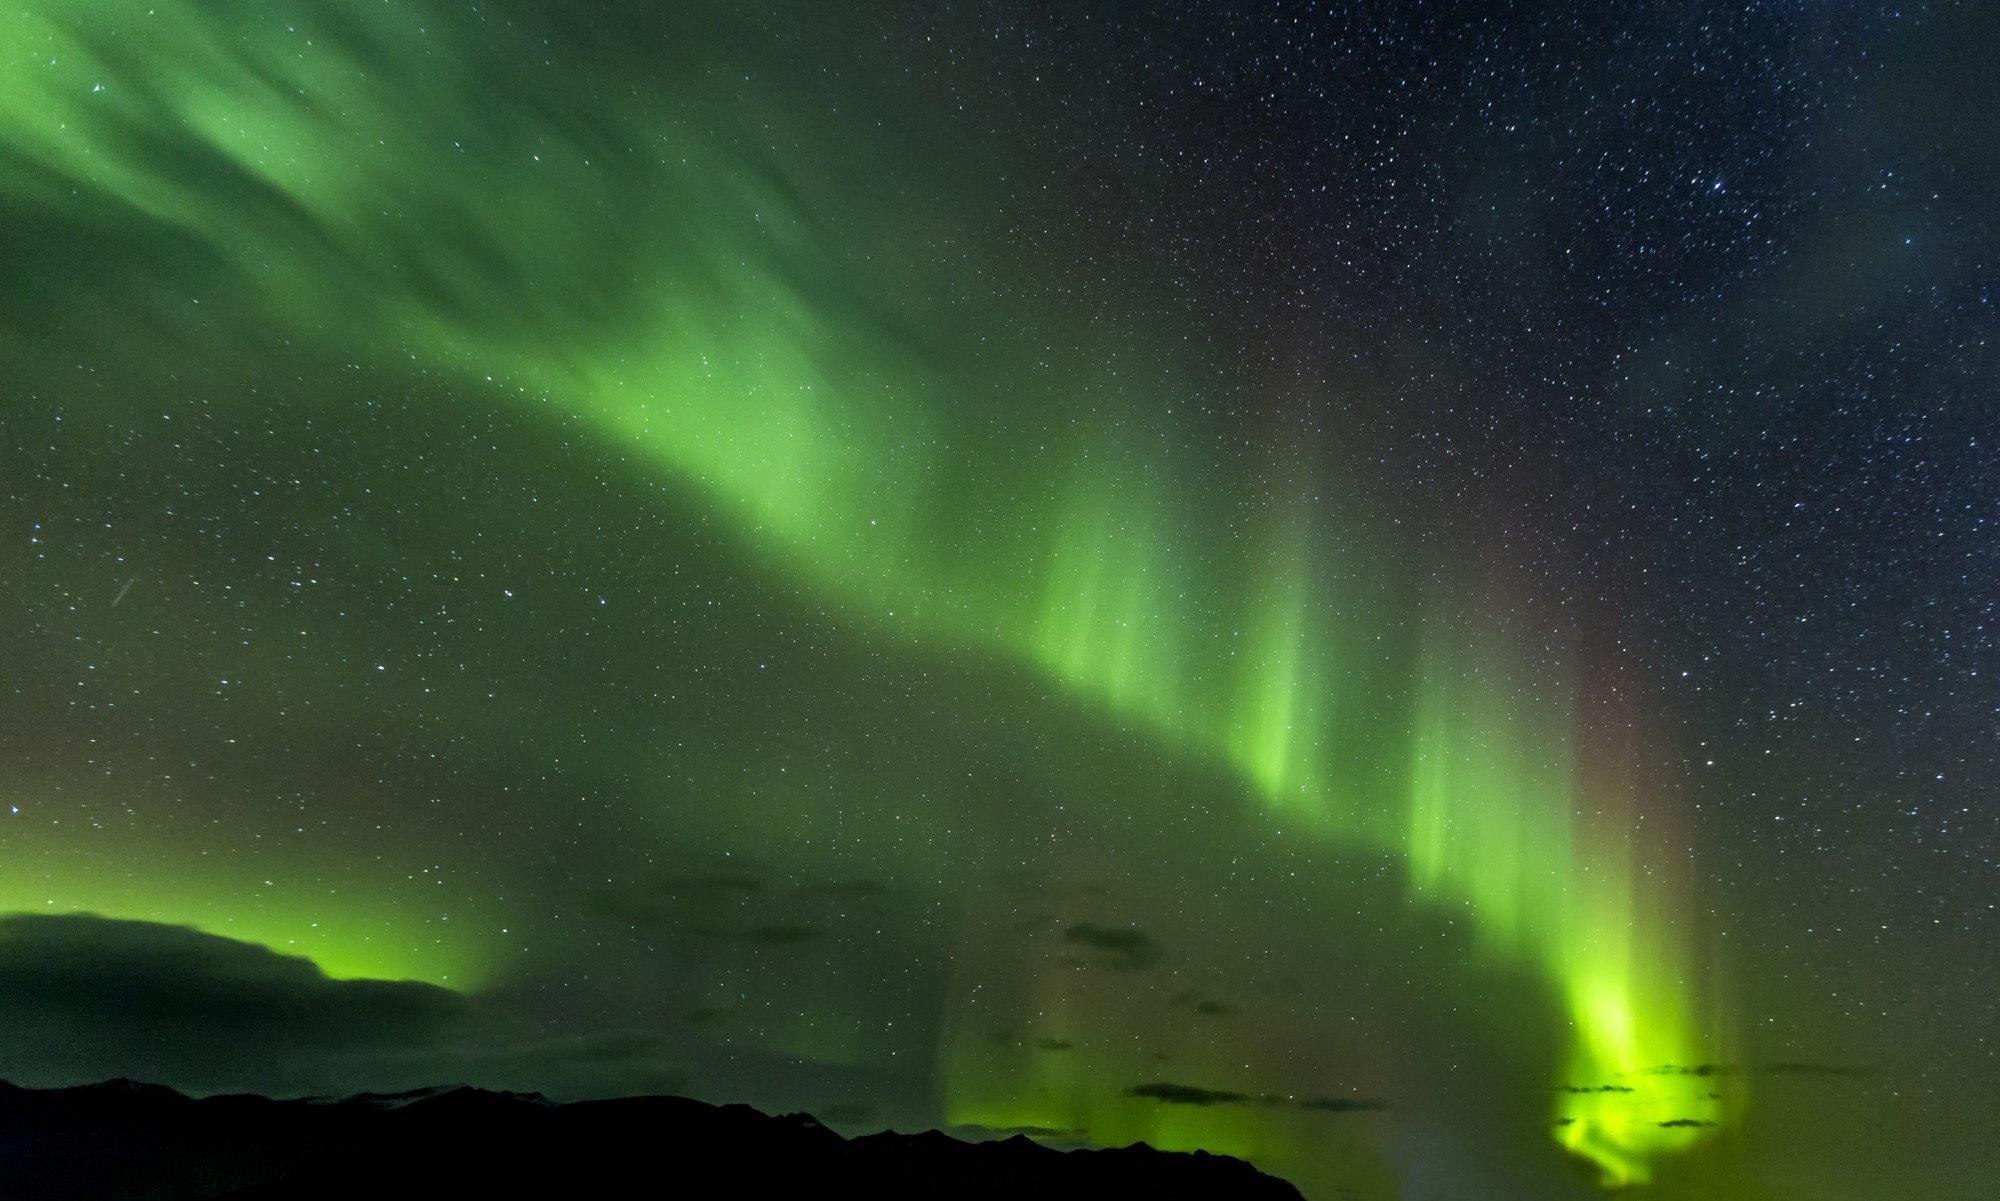 http://extranet.jetlinetravel.info/express-images/express_stunning_iceland_break.jpg